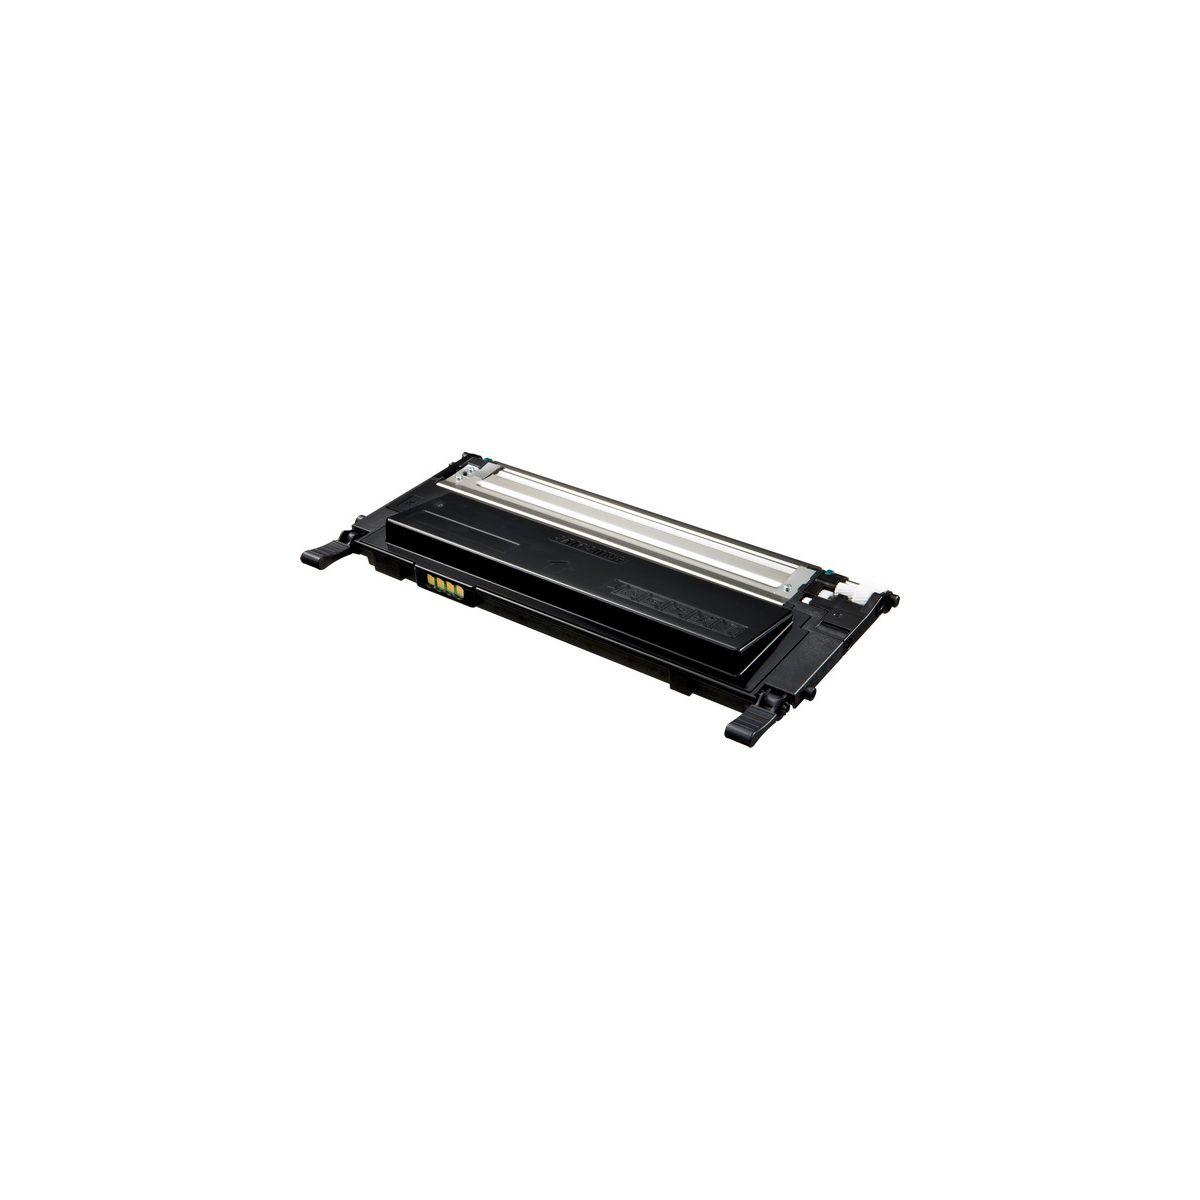 Toner samsung clt-k4092s noir - livraison offerte : code premium